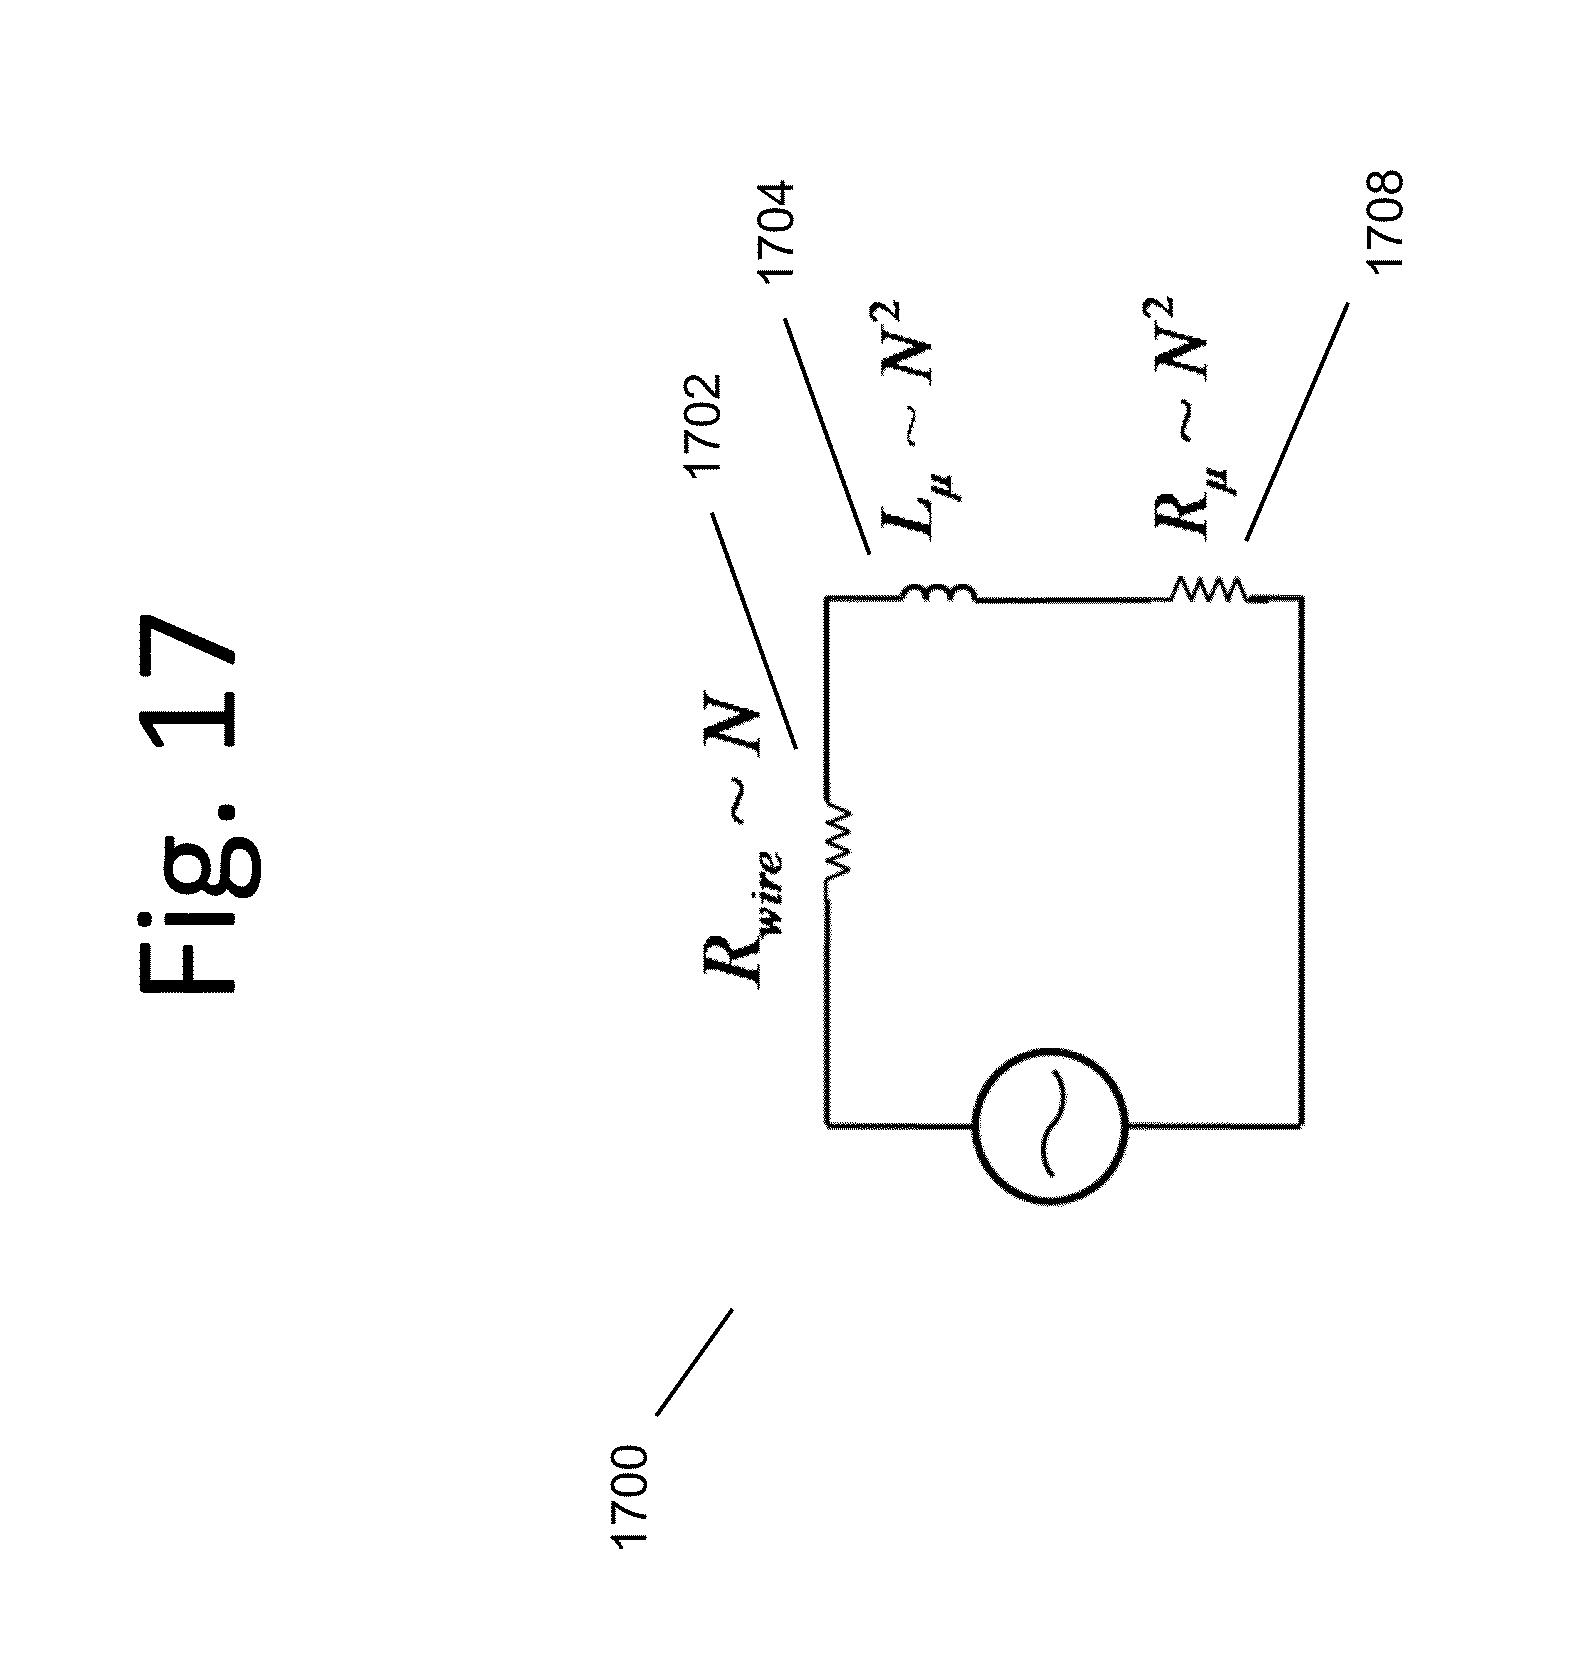 Patent Us 8324759 B2 Furthermore Garage Door Opener Safety Sensor Wiring Plc Images